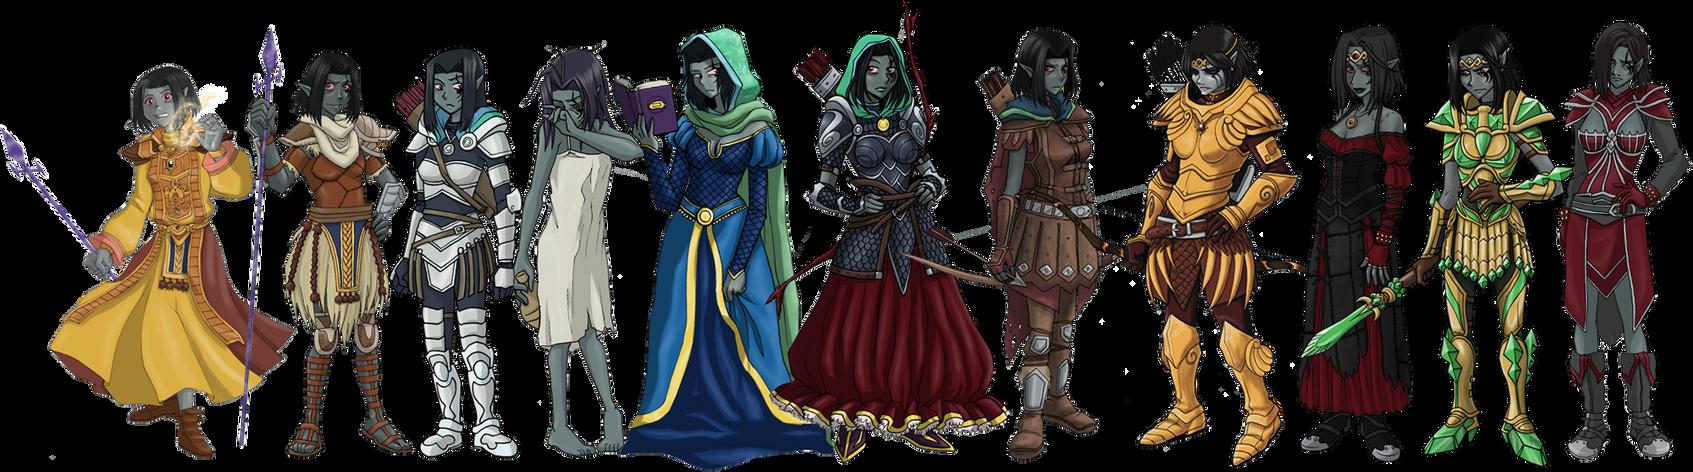 Misora's outfits by pyrogina